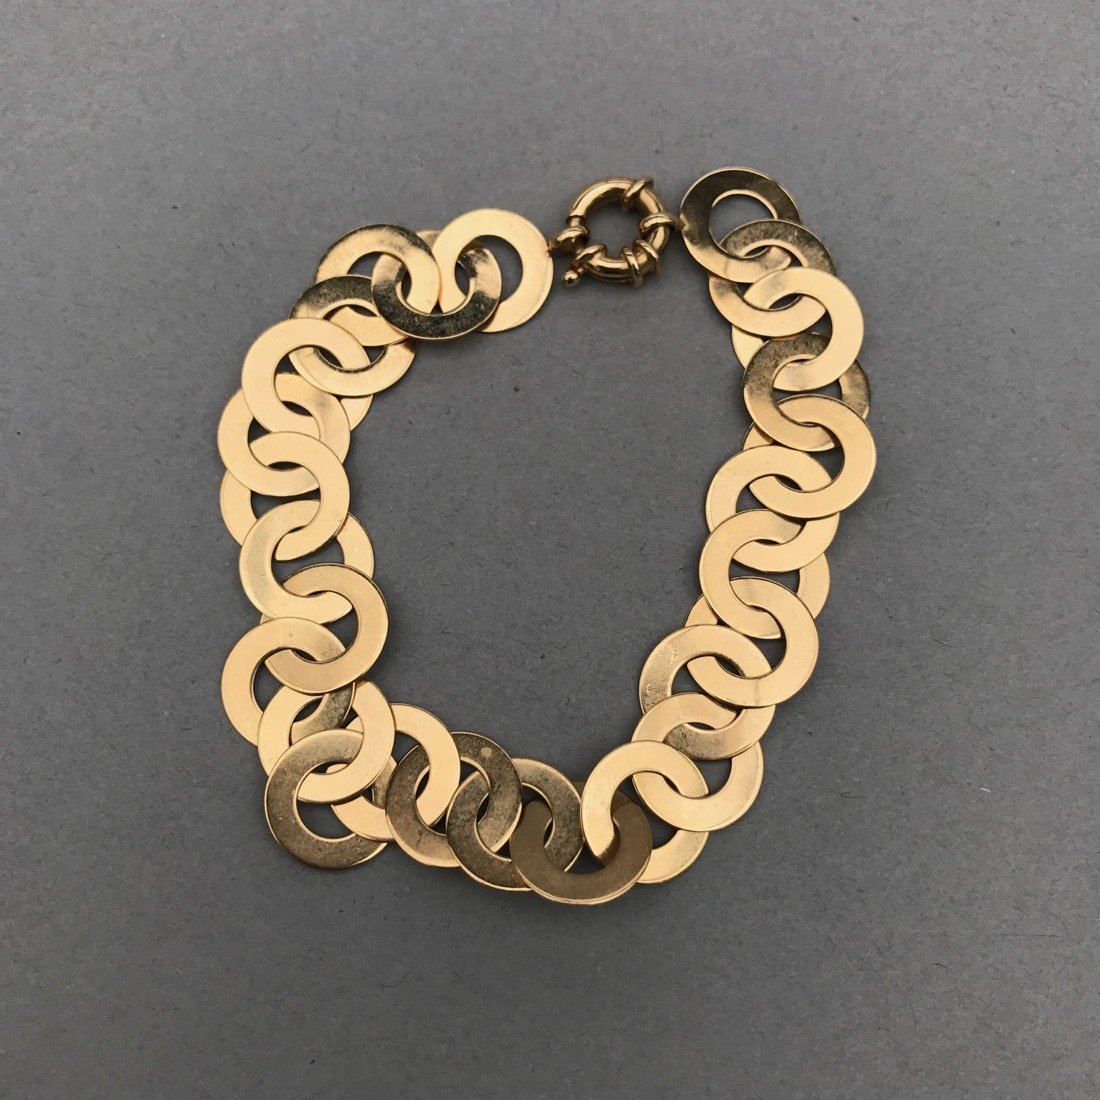 14K Gold Flat Circle Bracelet - 2